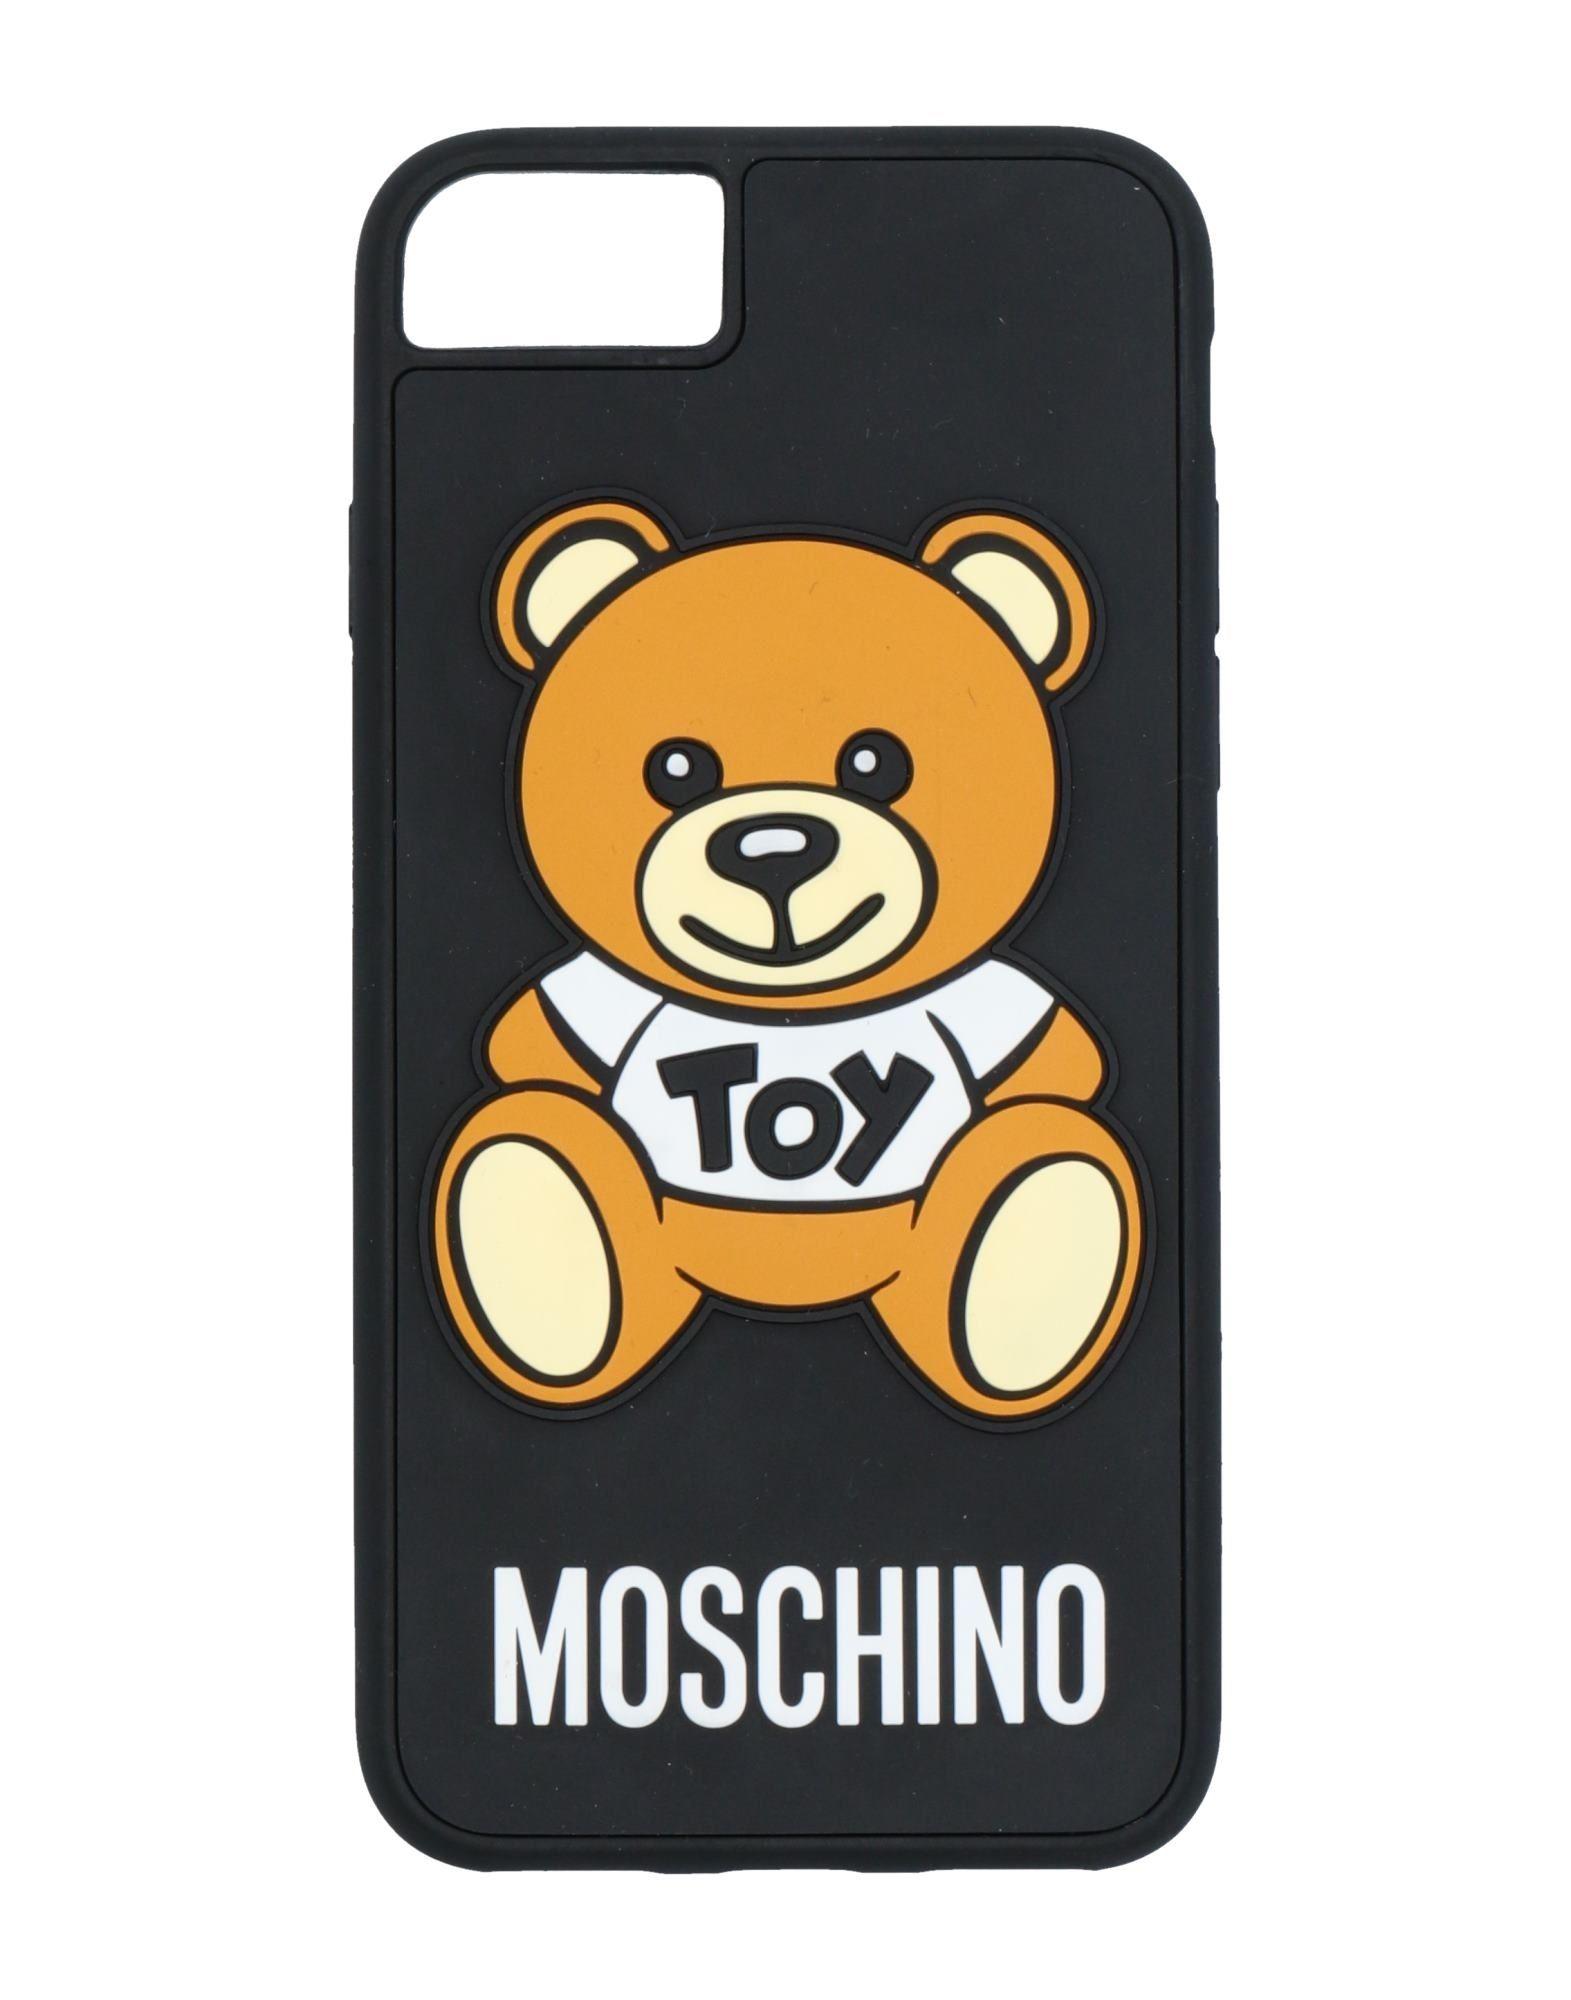 Фото - MOSCHINO Чехол кейс для назначение apple iphone 8 iphone 8 plus кейс для iphone 5 iphone 6 iphone 6 plus iphone 7 plus iphone 7 со стендом с окошком флип